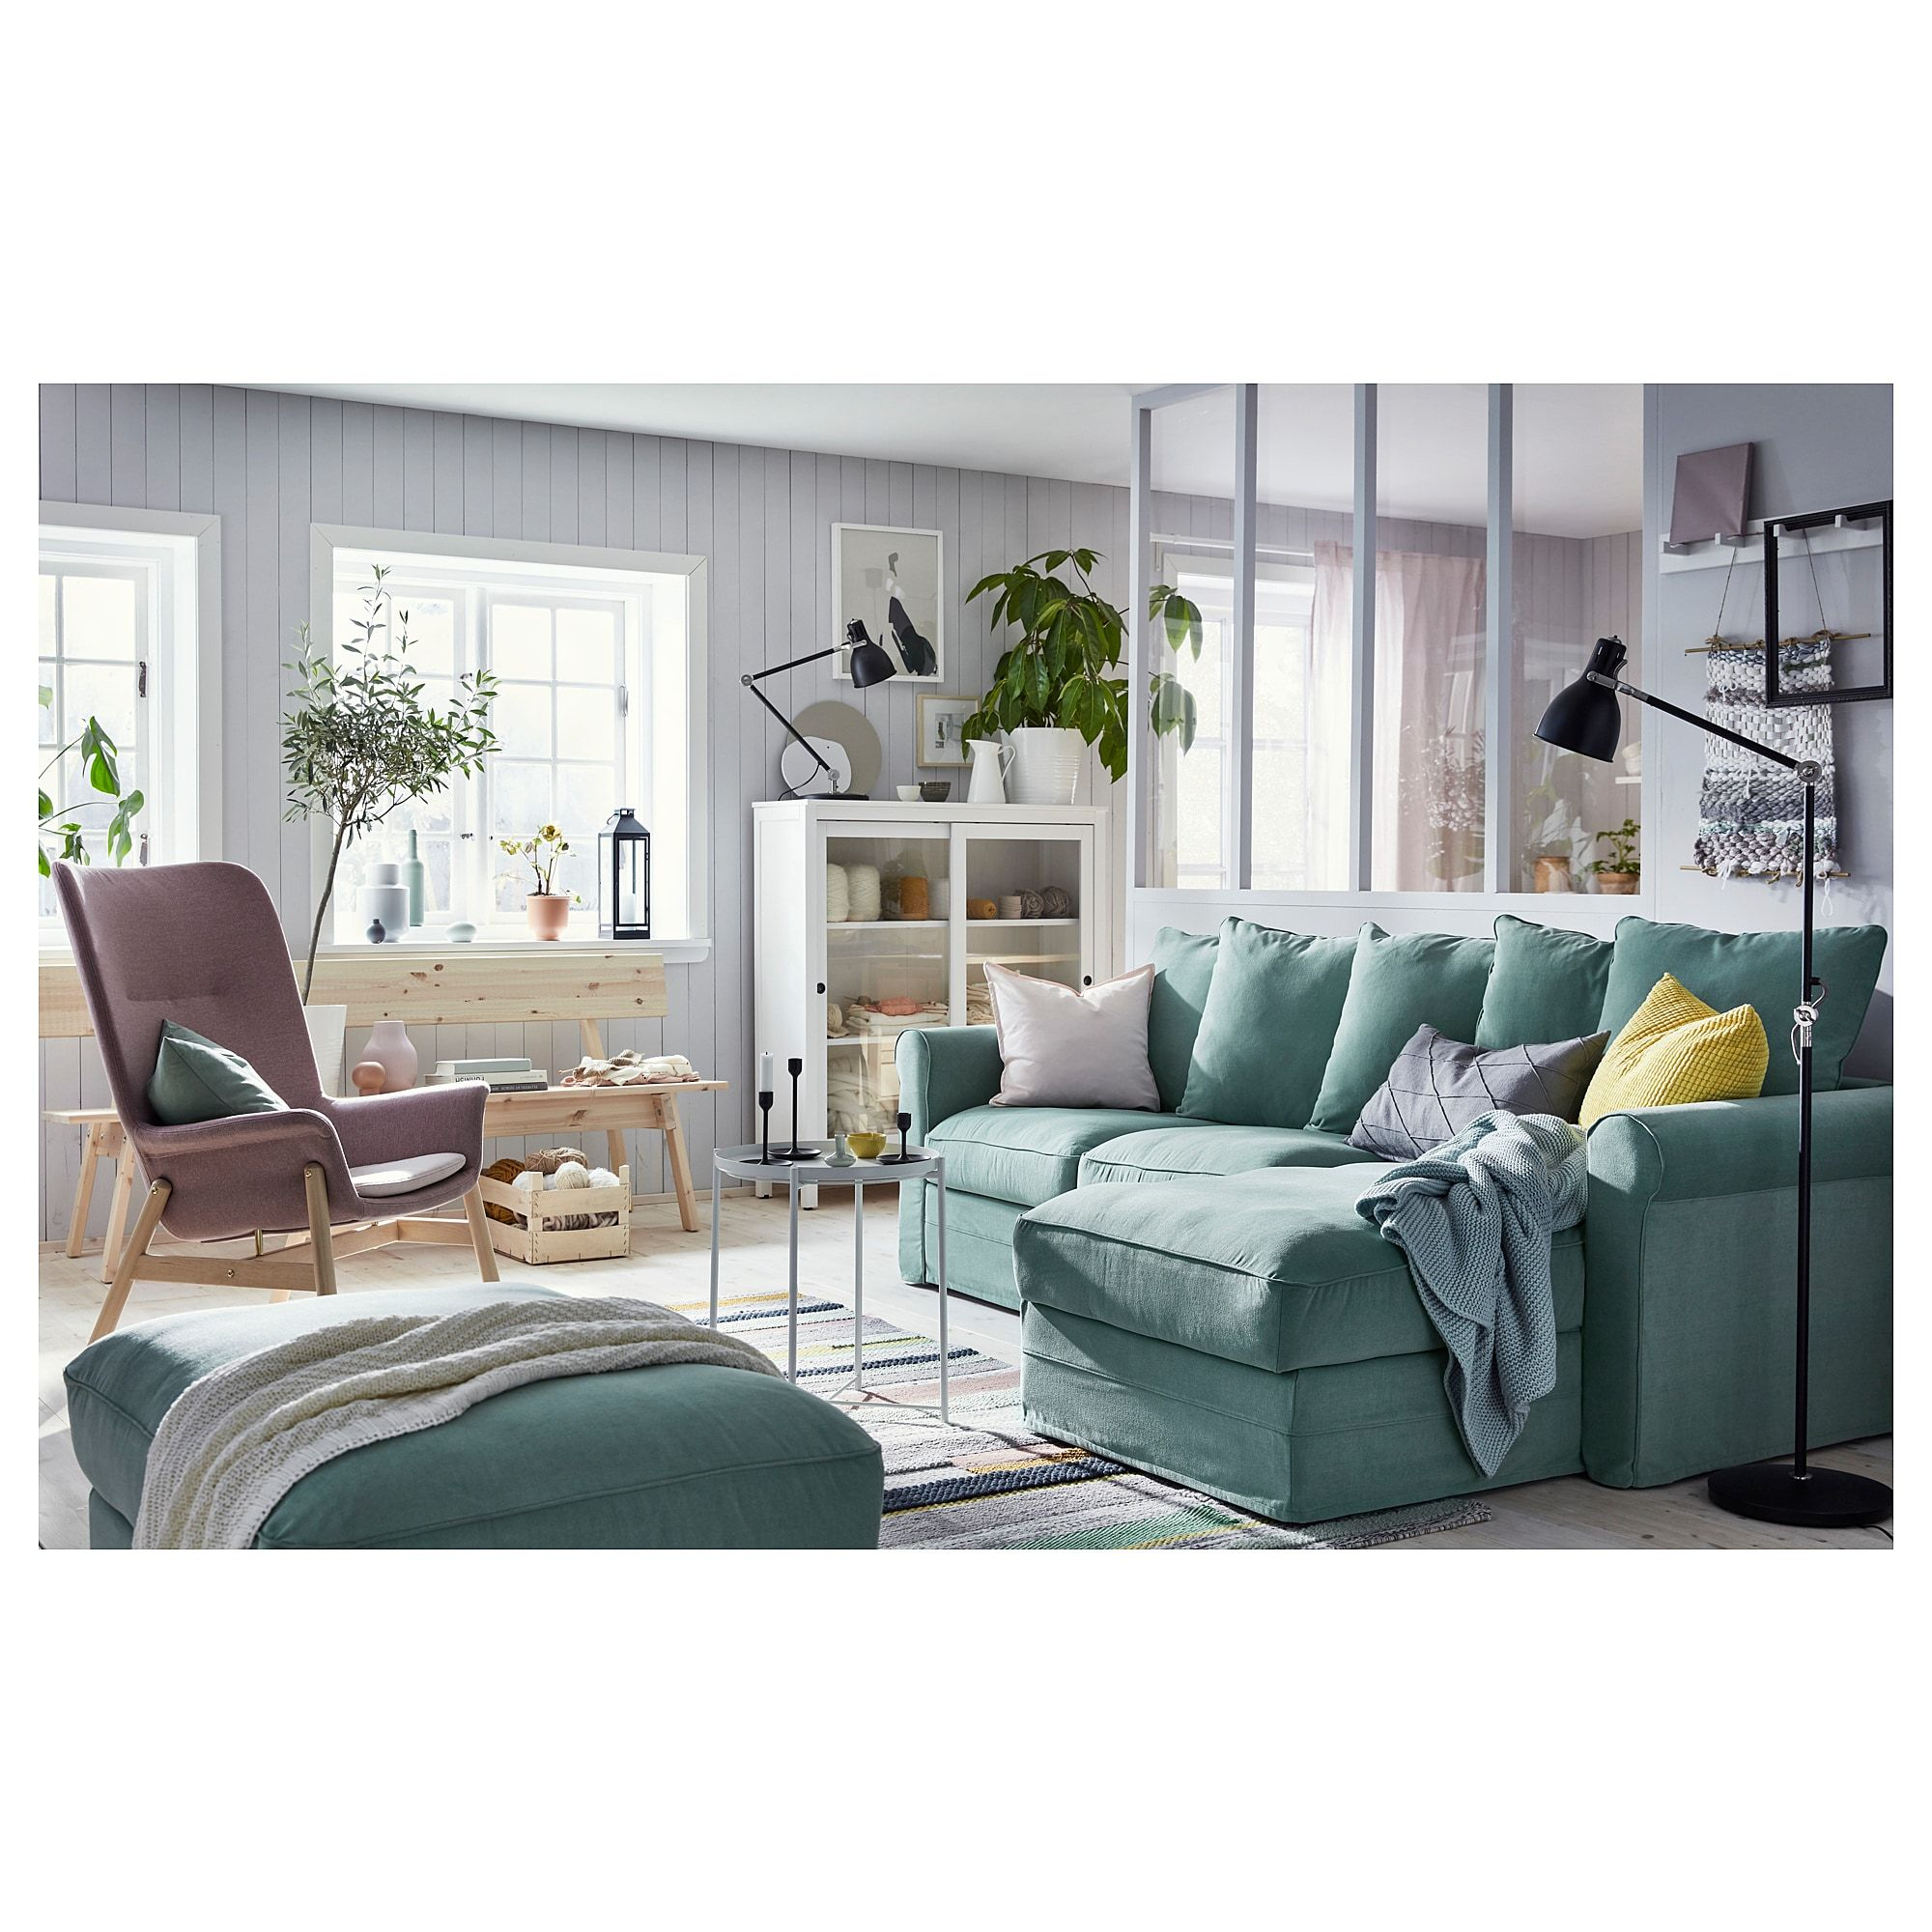 Furniture and Home Furnishings   Ikea living room, Living room sets, New living room